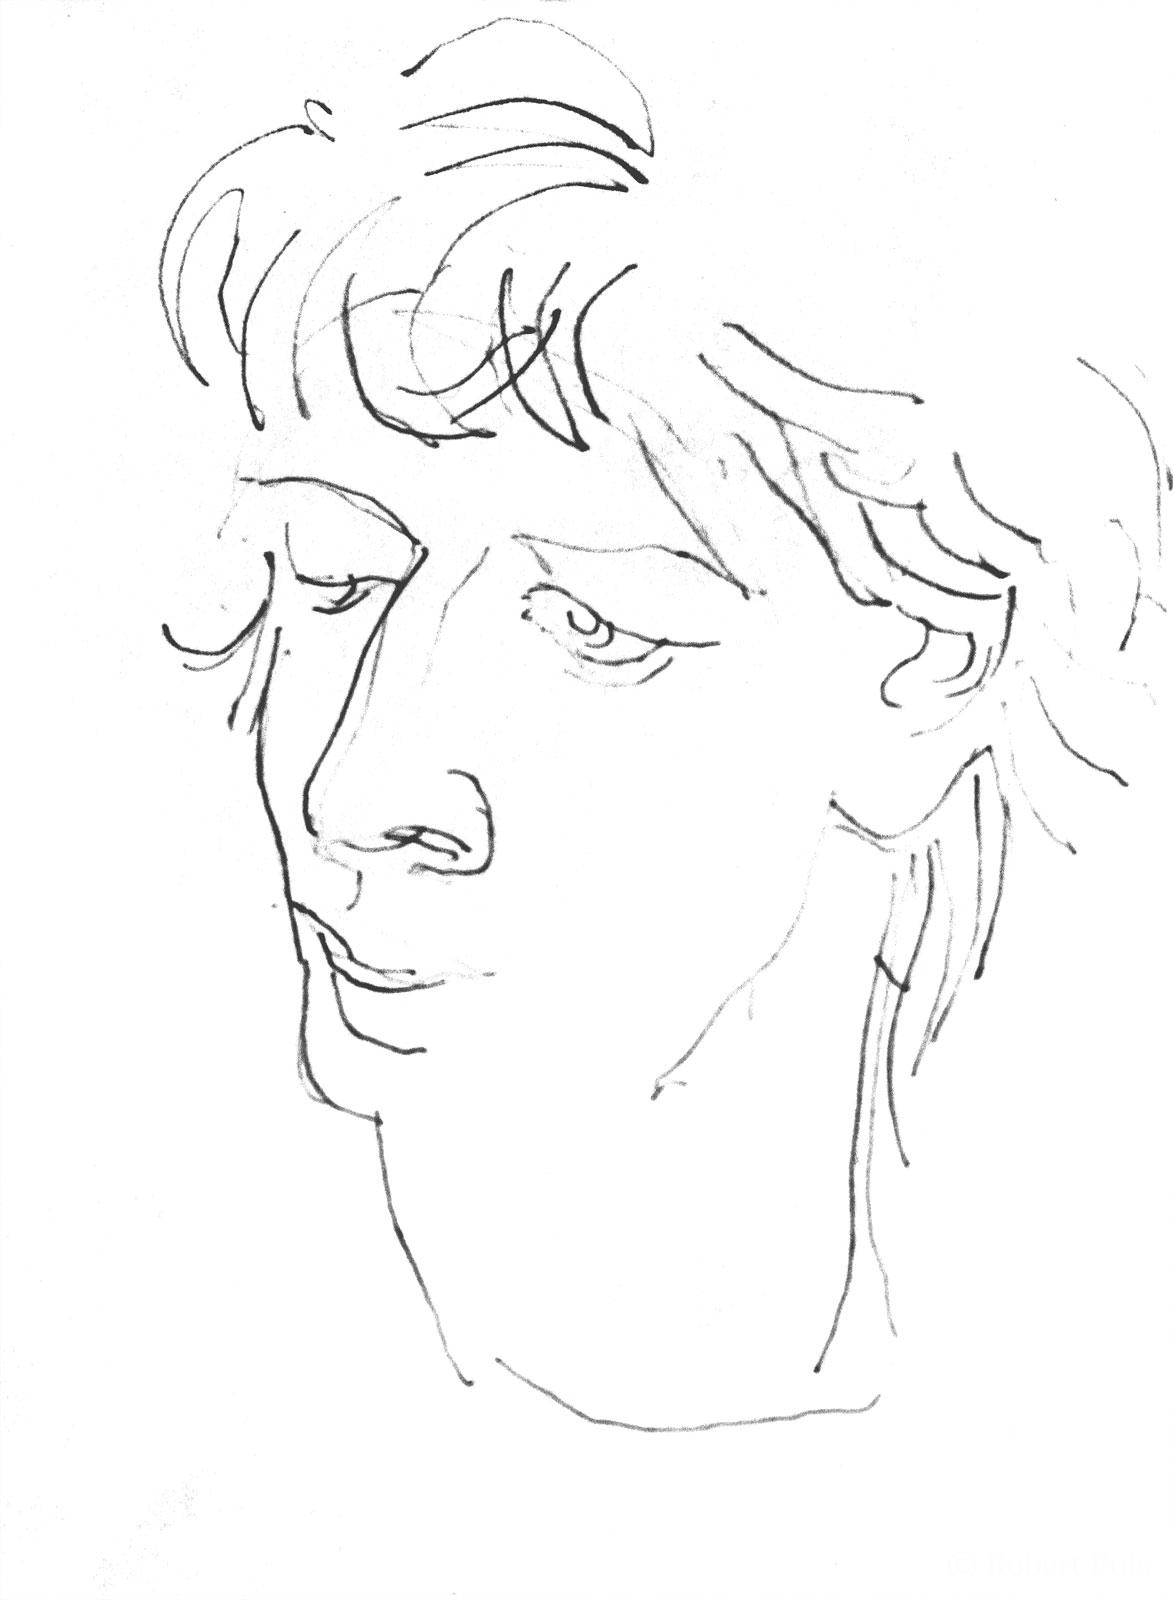 Jana Zeichnung Skizze